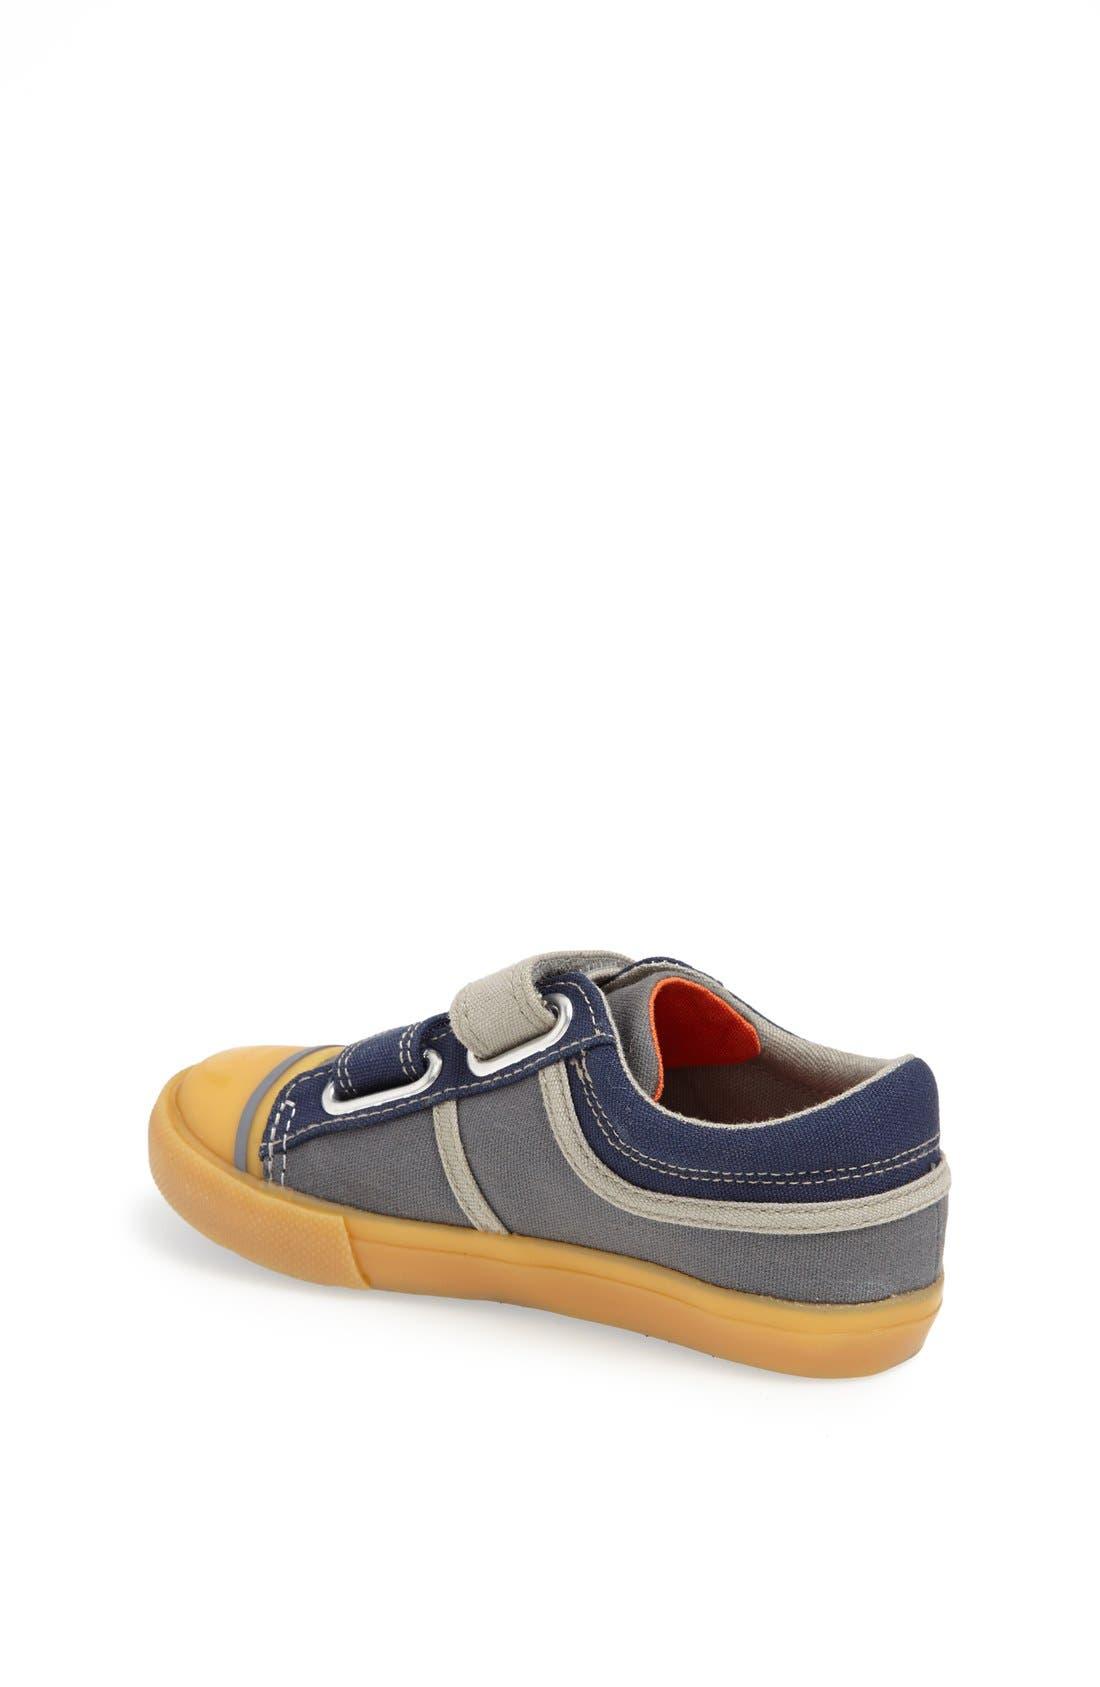 Alternate Image 2  - Umi 'Mack' Sneaker (Toddler, Little Kid & Big Kid)